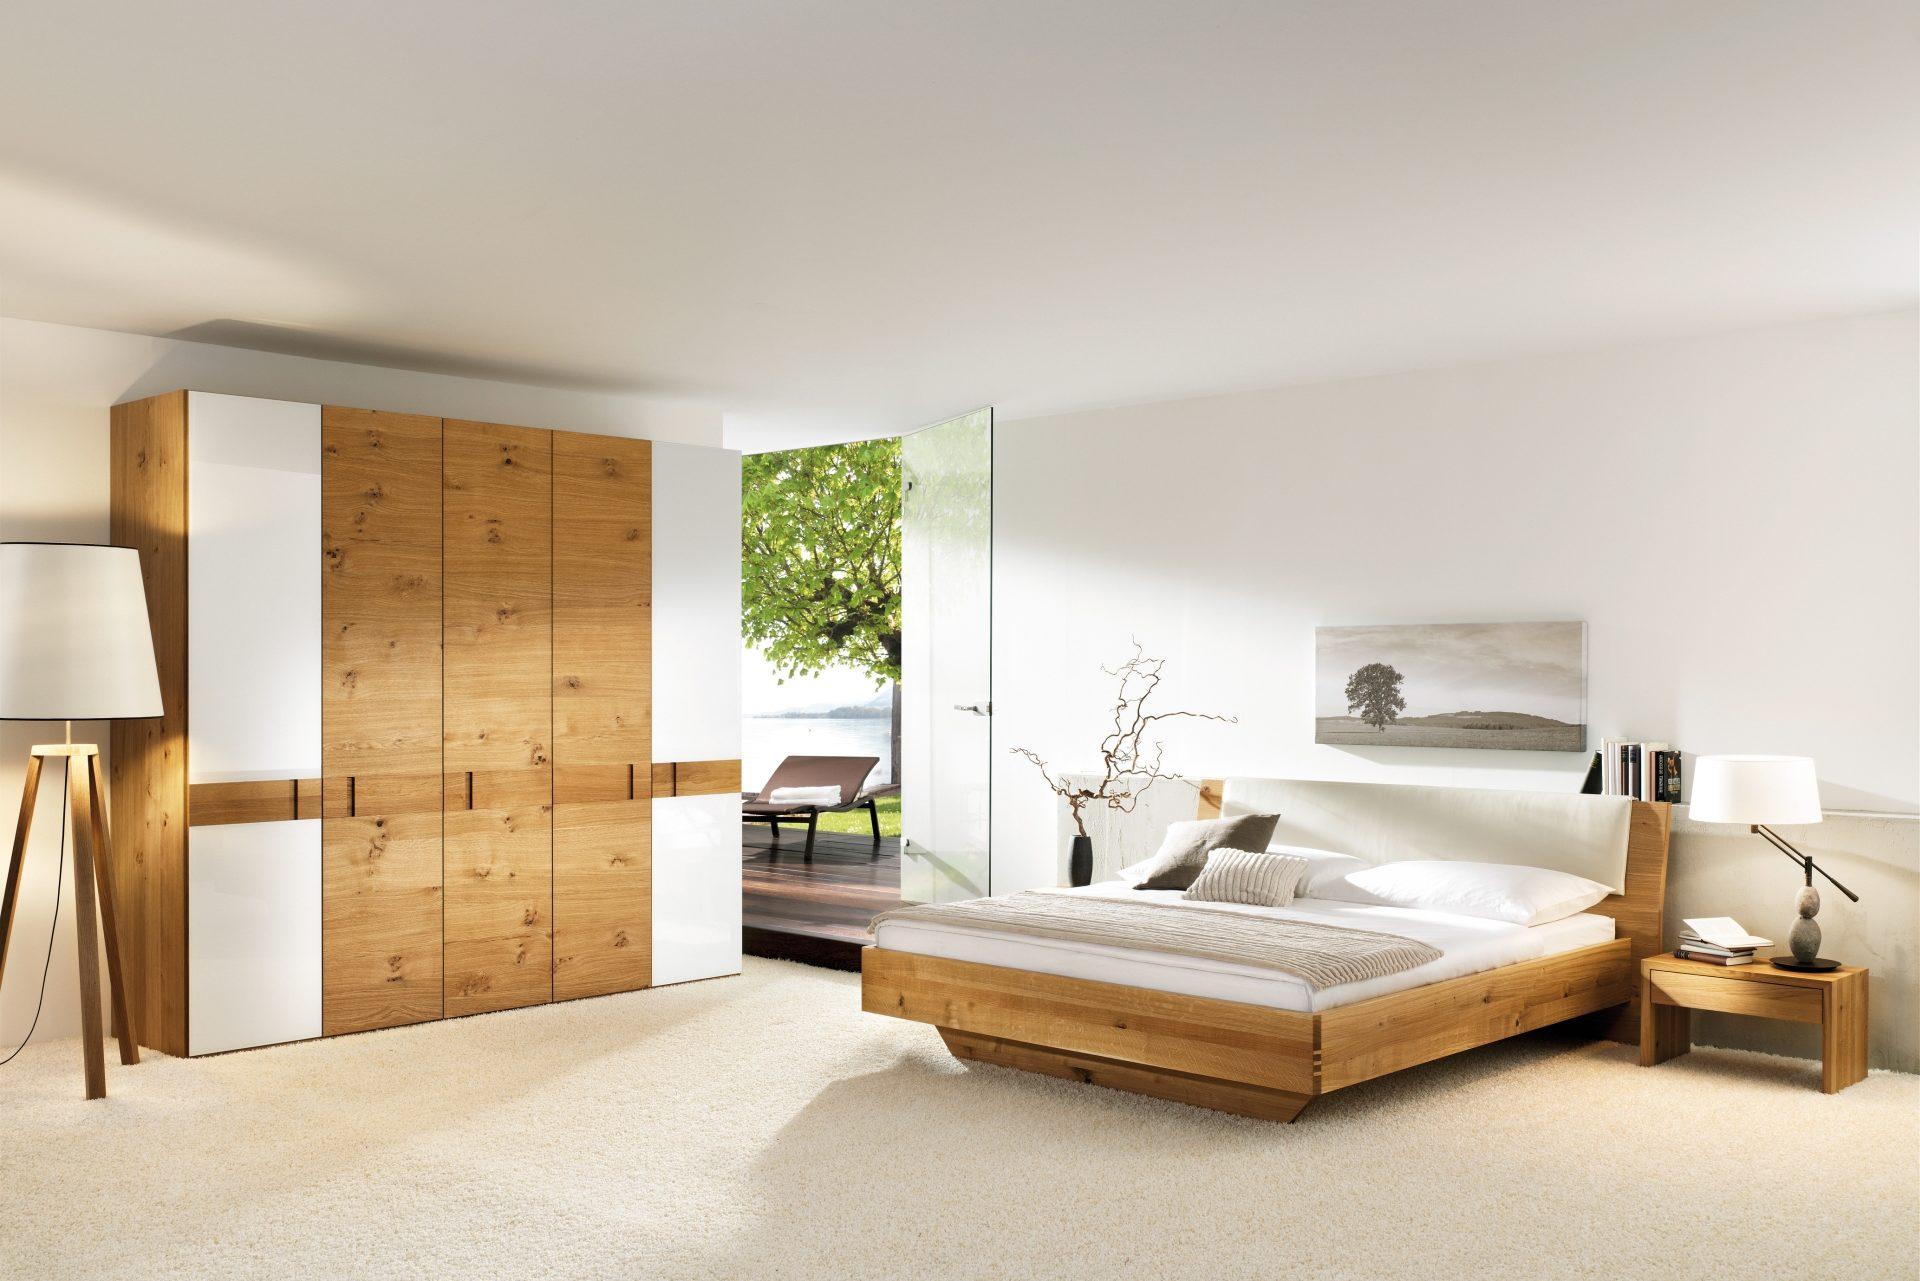 kleiderschrank rio kohler nat rlich einrichten naturholzm bel team 7 naturm bel massivholzm bel. Black Bedroom Furniture Sets. Home Design Ideas